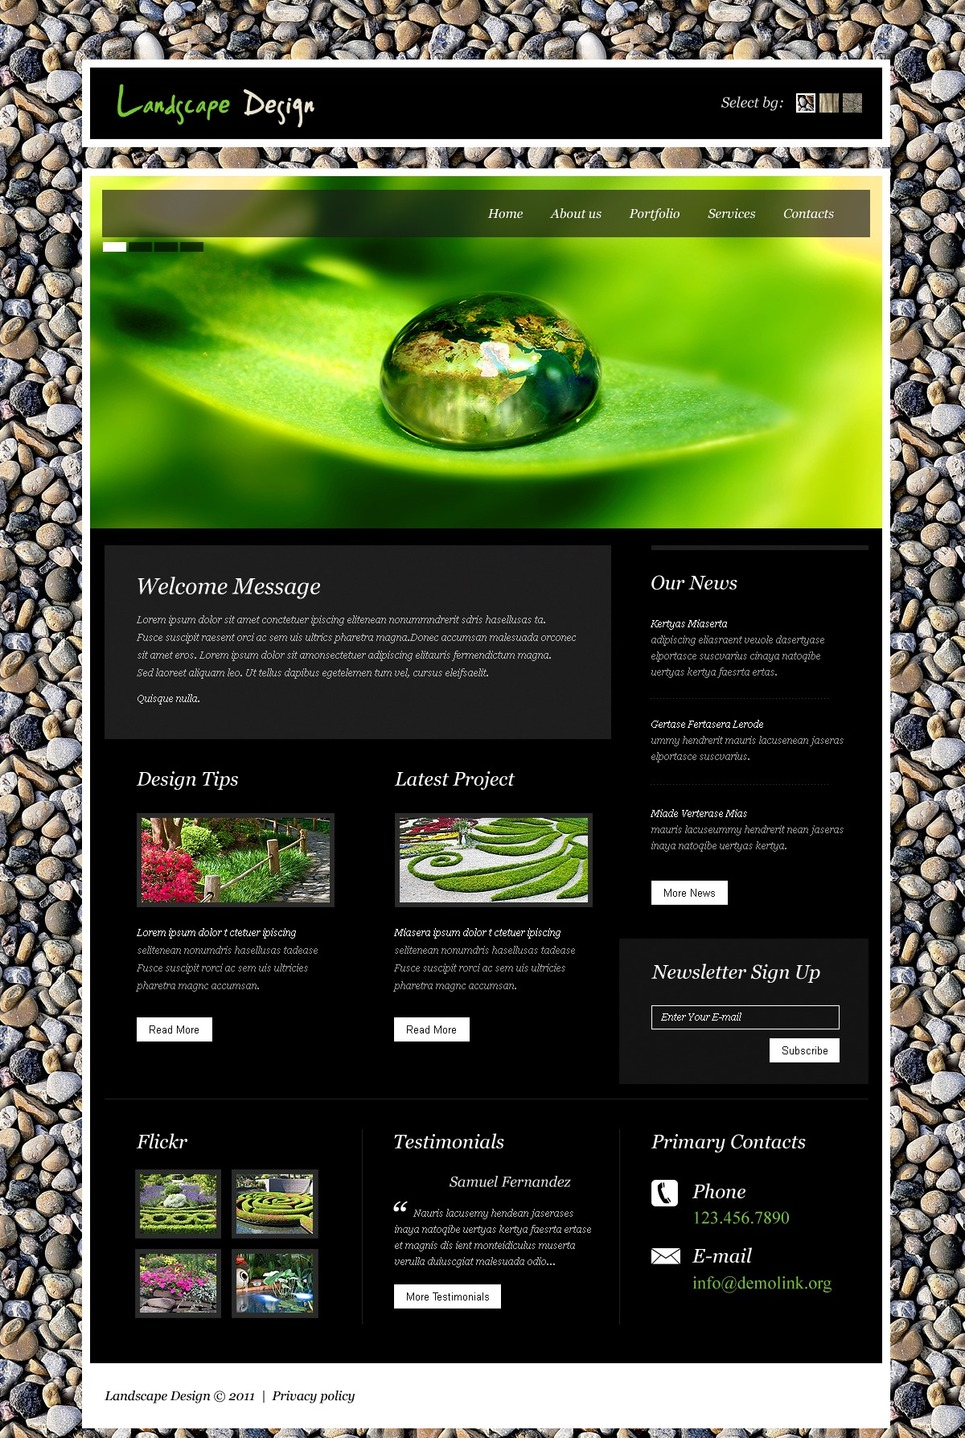 Landscape Design Turnkey Website 2.0 New Screenshots BIG